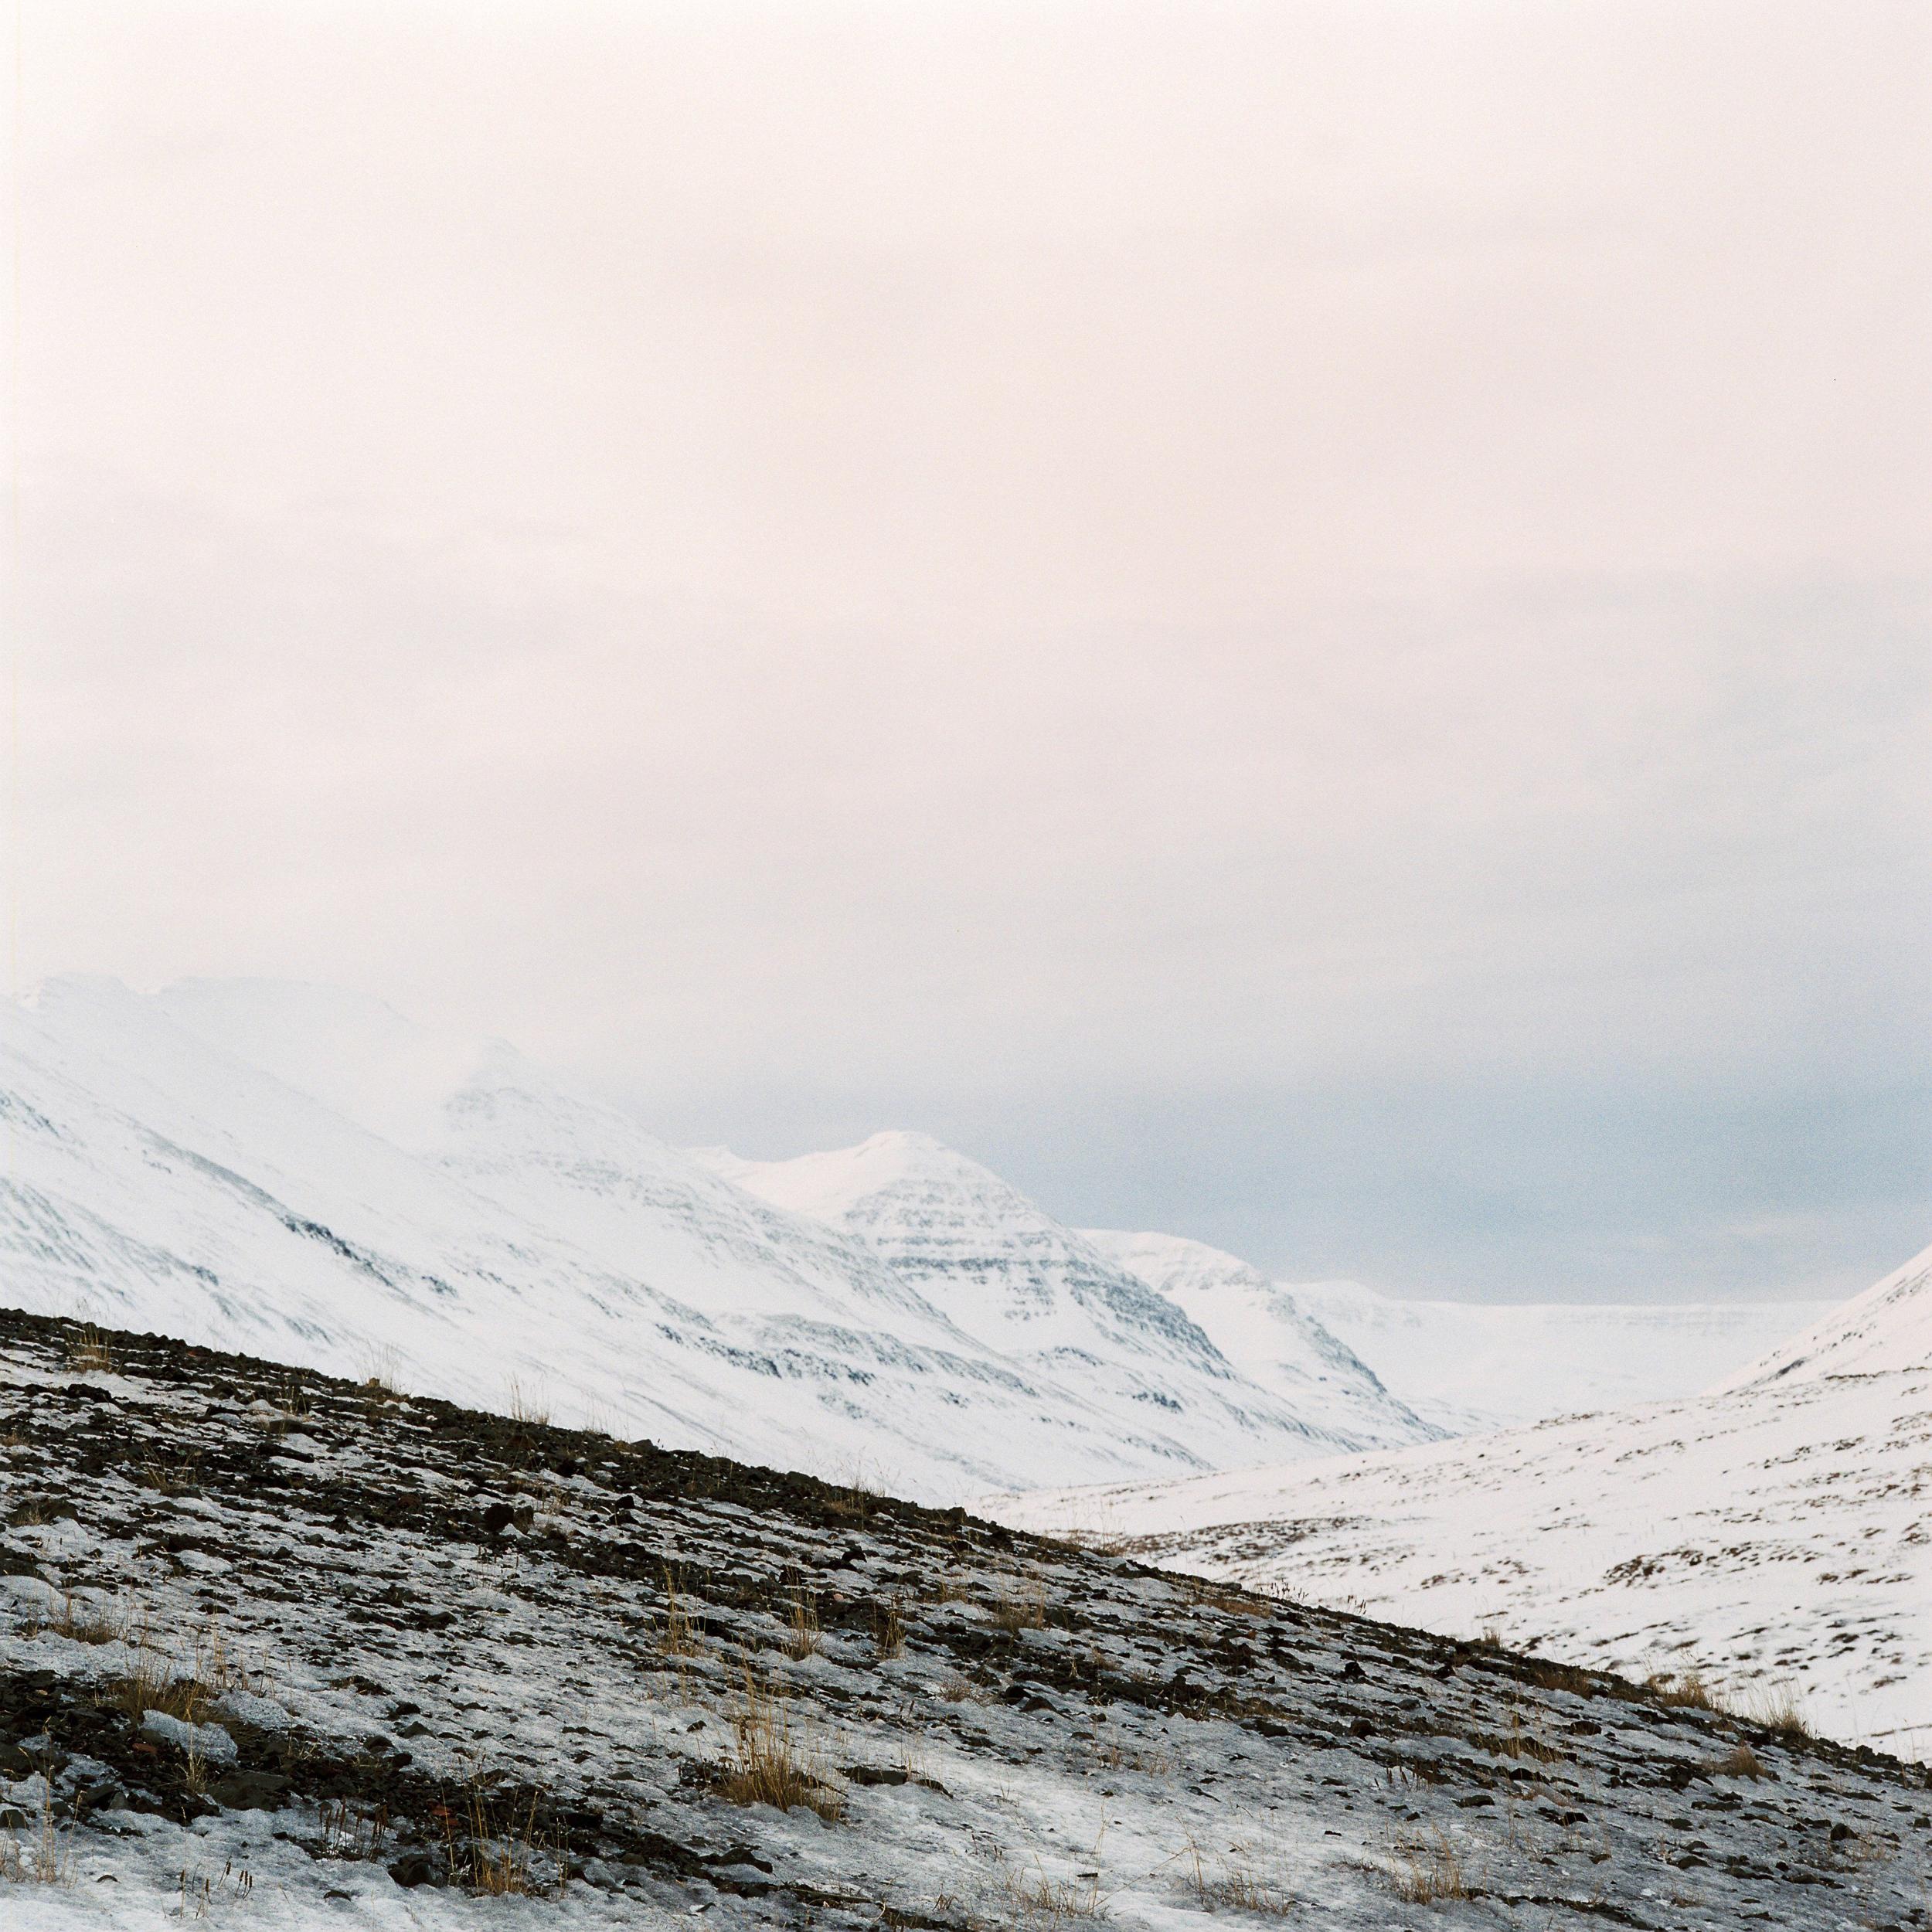 Iceland-Snow-8.jpg